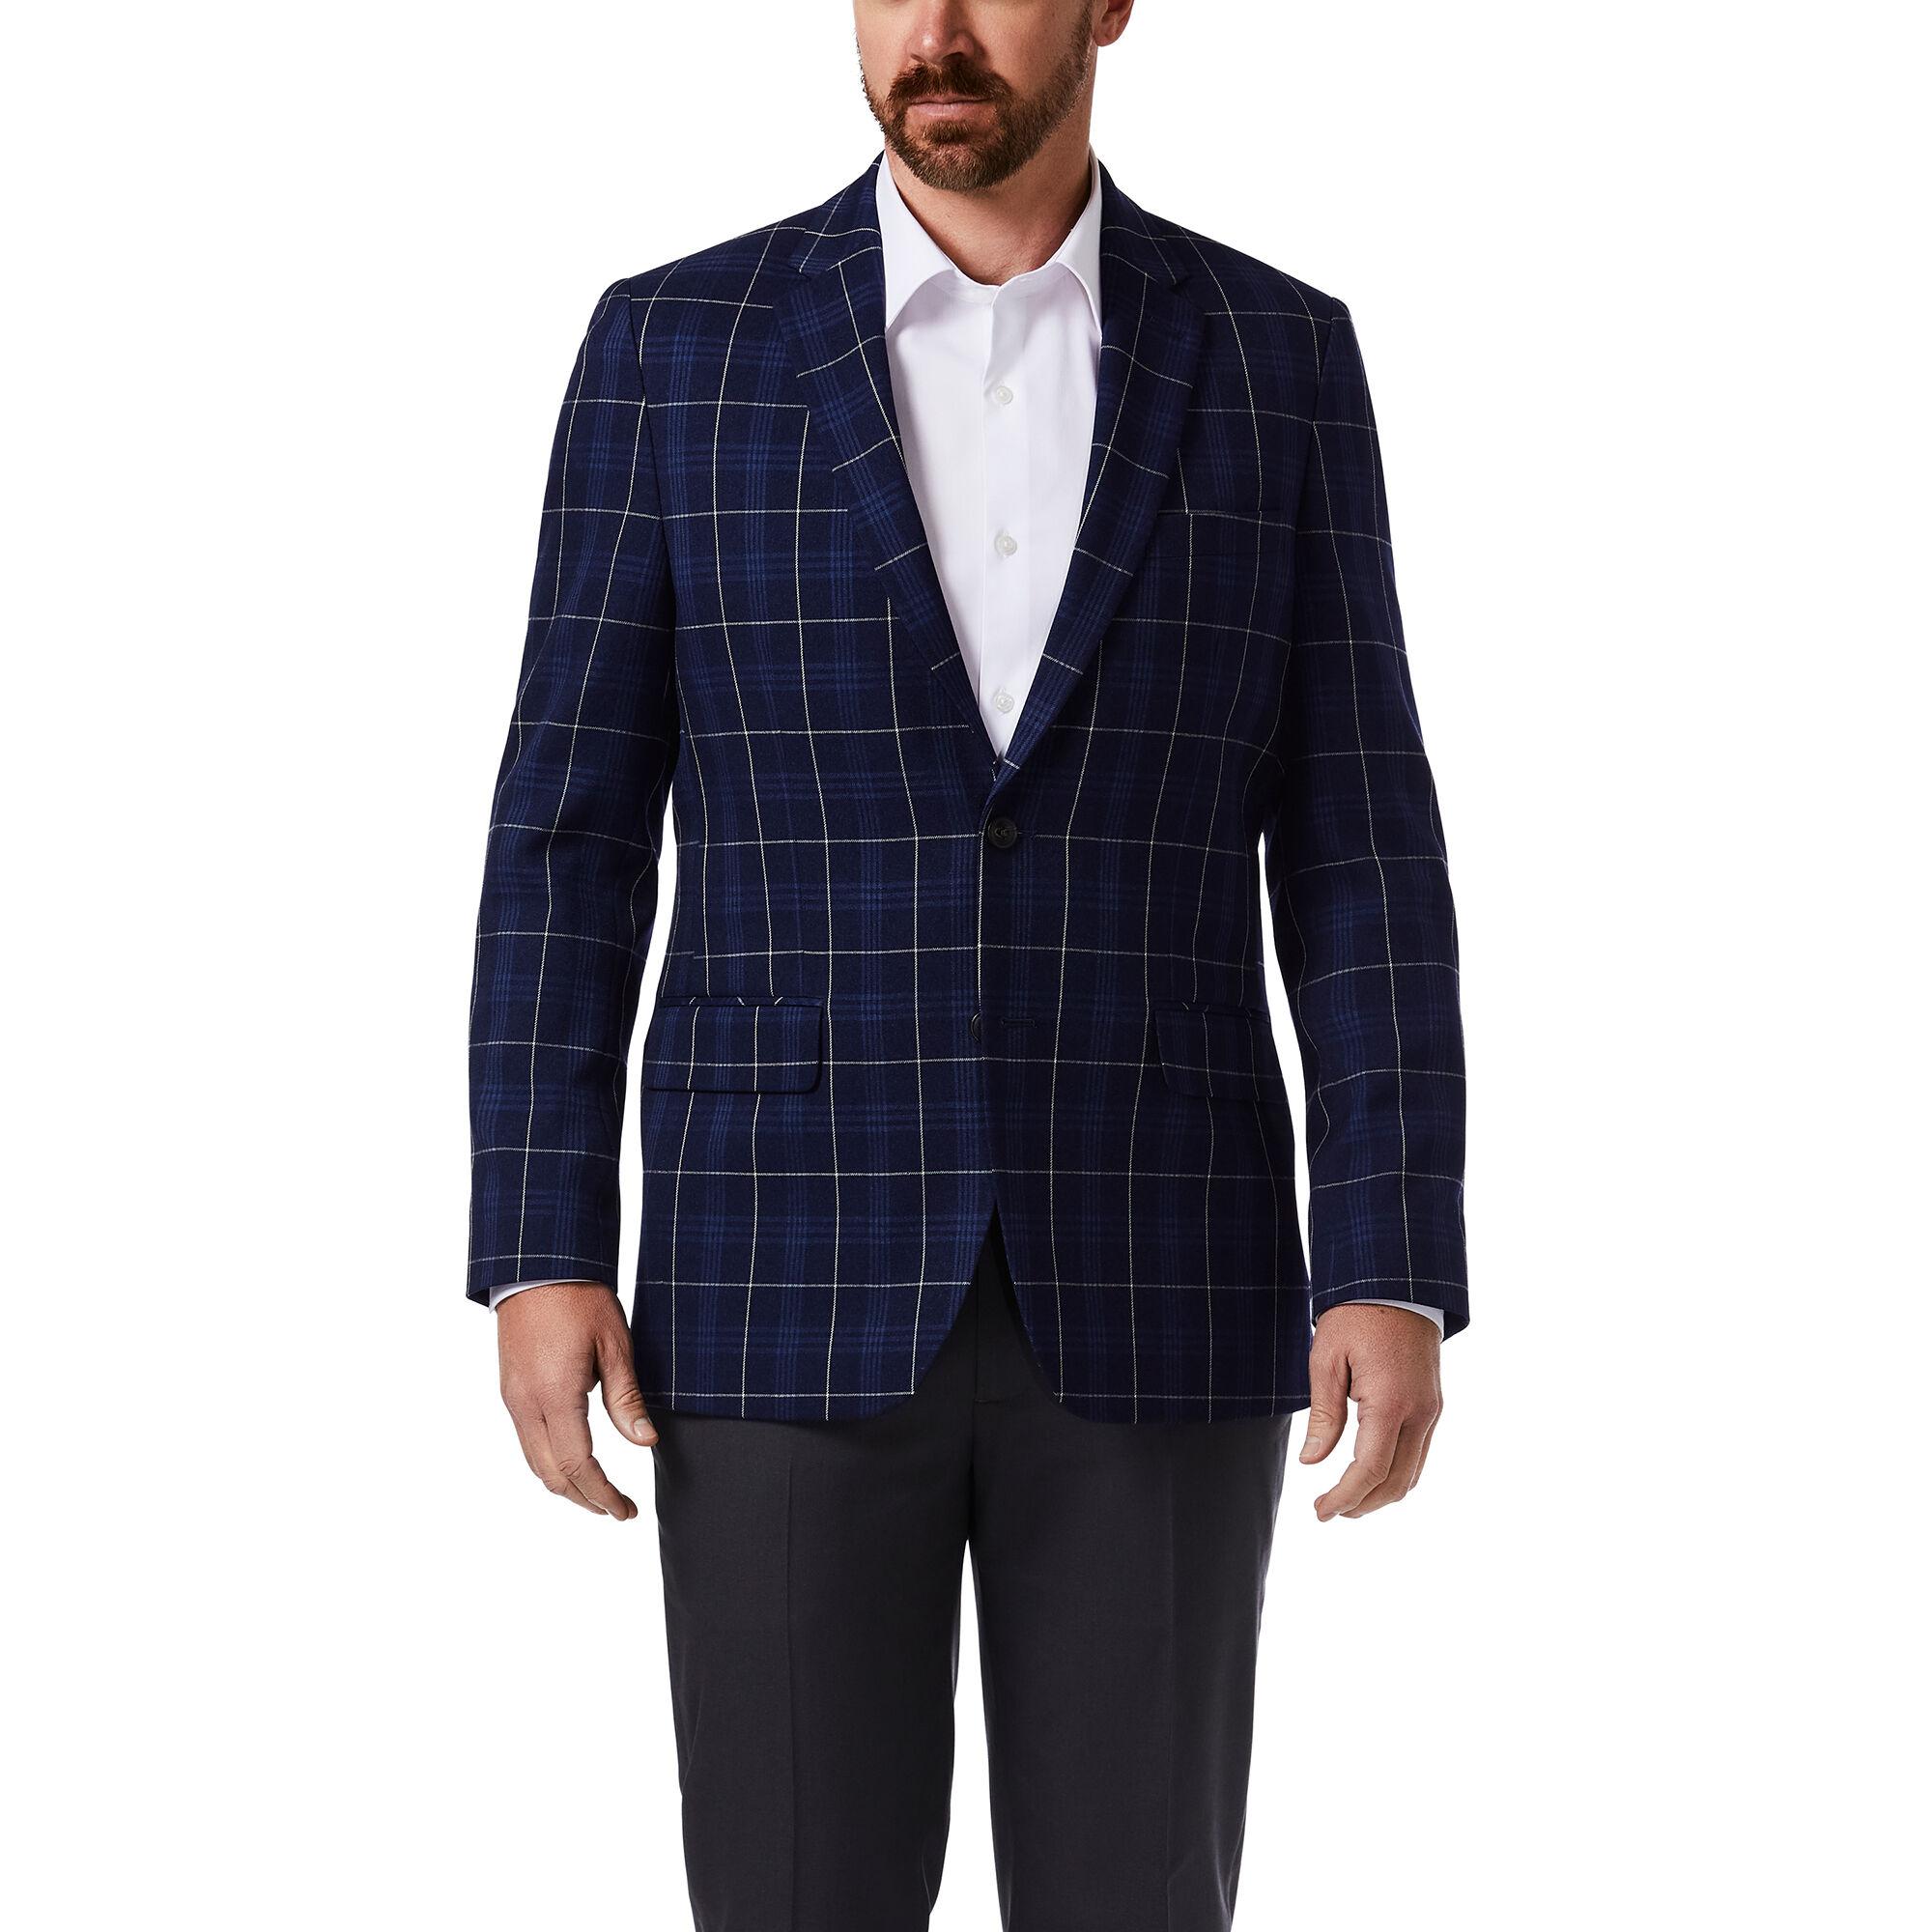 Details about  /Haggar Men/'s Signature Plaid Tailored Fit Flat Fro Choose SZ//color